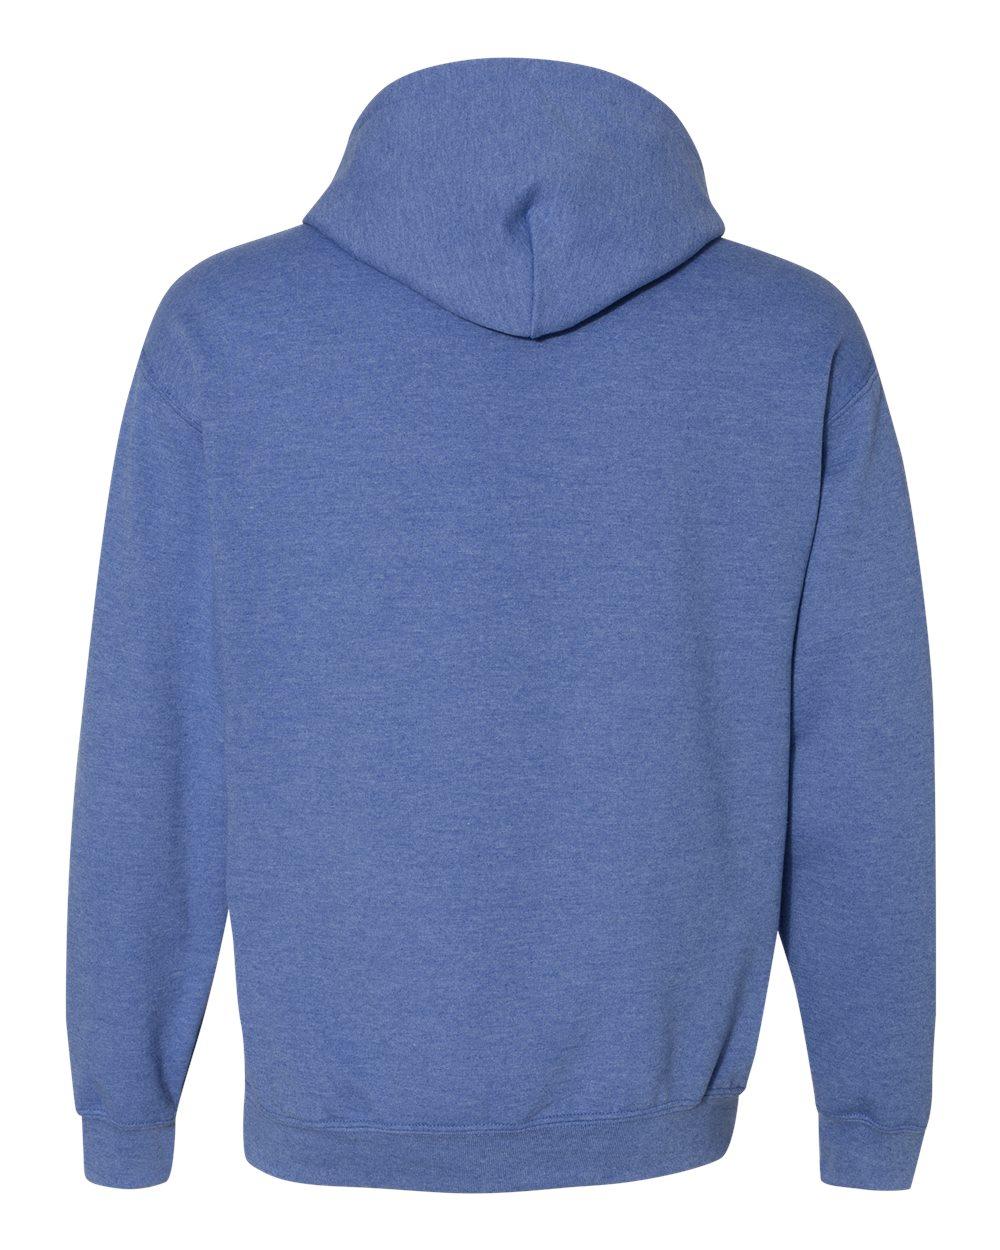 Gildan-Mens-Blank-Hoodie-Heavy-Blend-Hooded-Sweatshirt-18500-up-to-5XL thumbnail 31